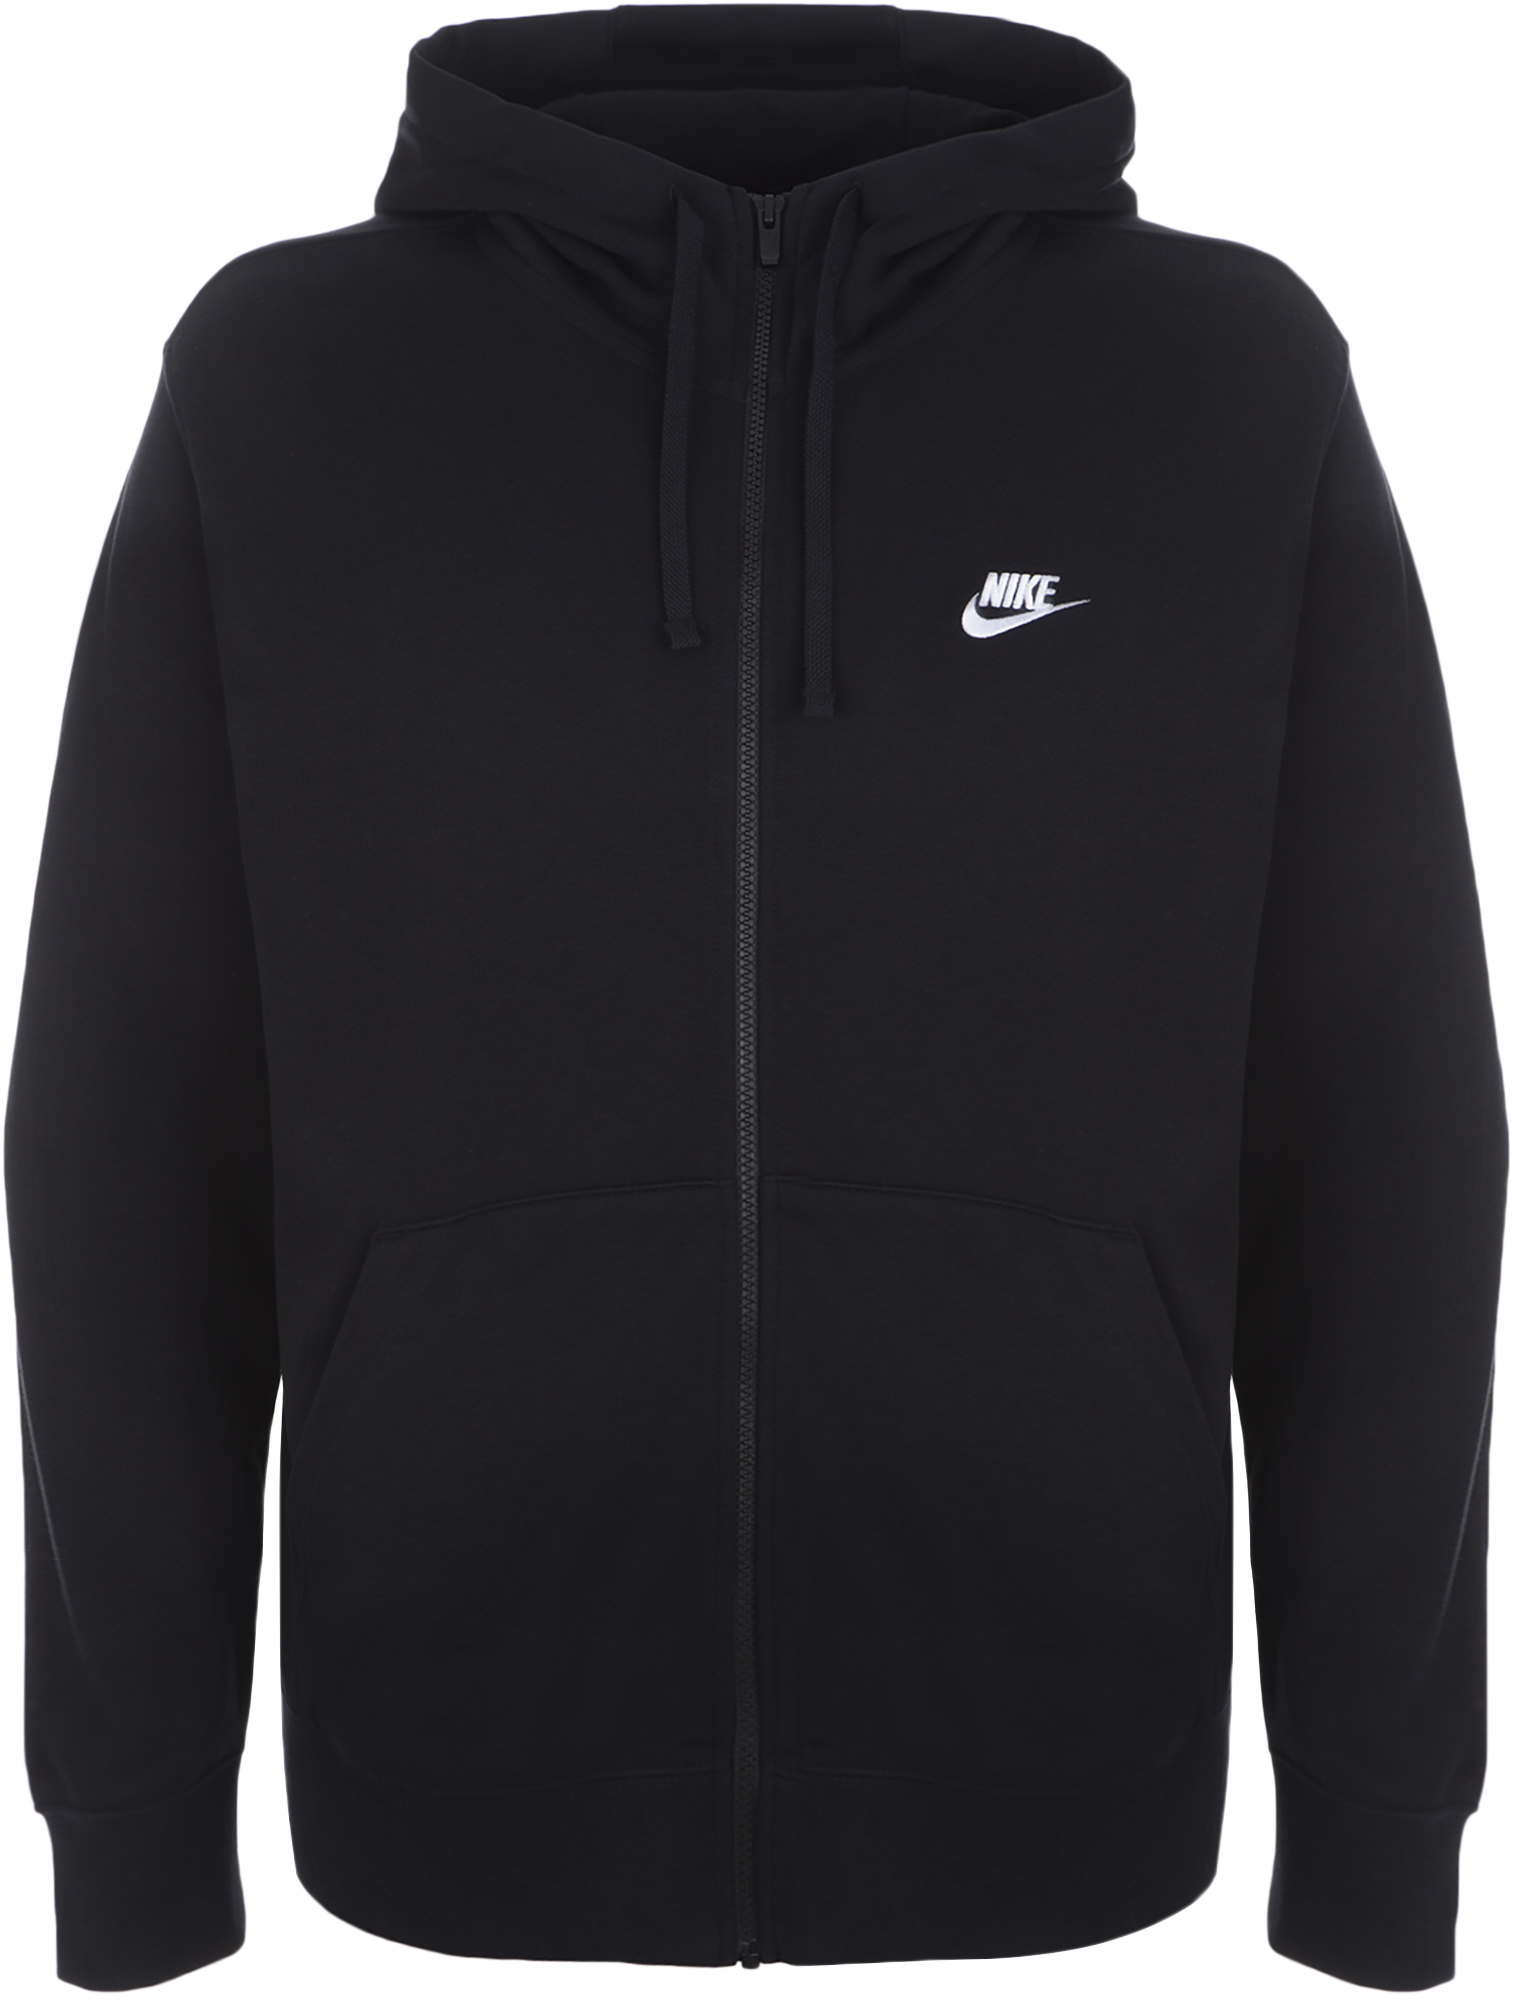 Nike Толстовка мужская Sportswear Club, размер 54-56